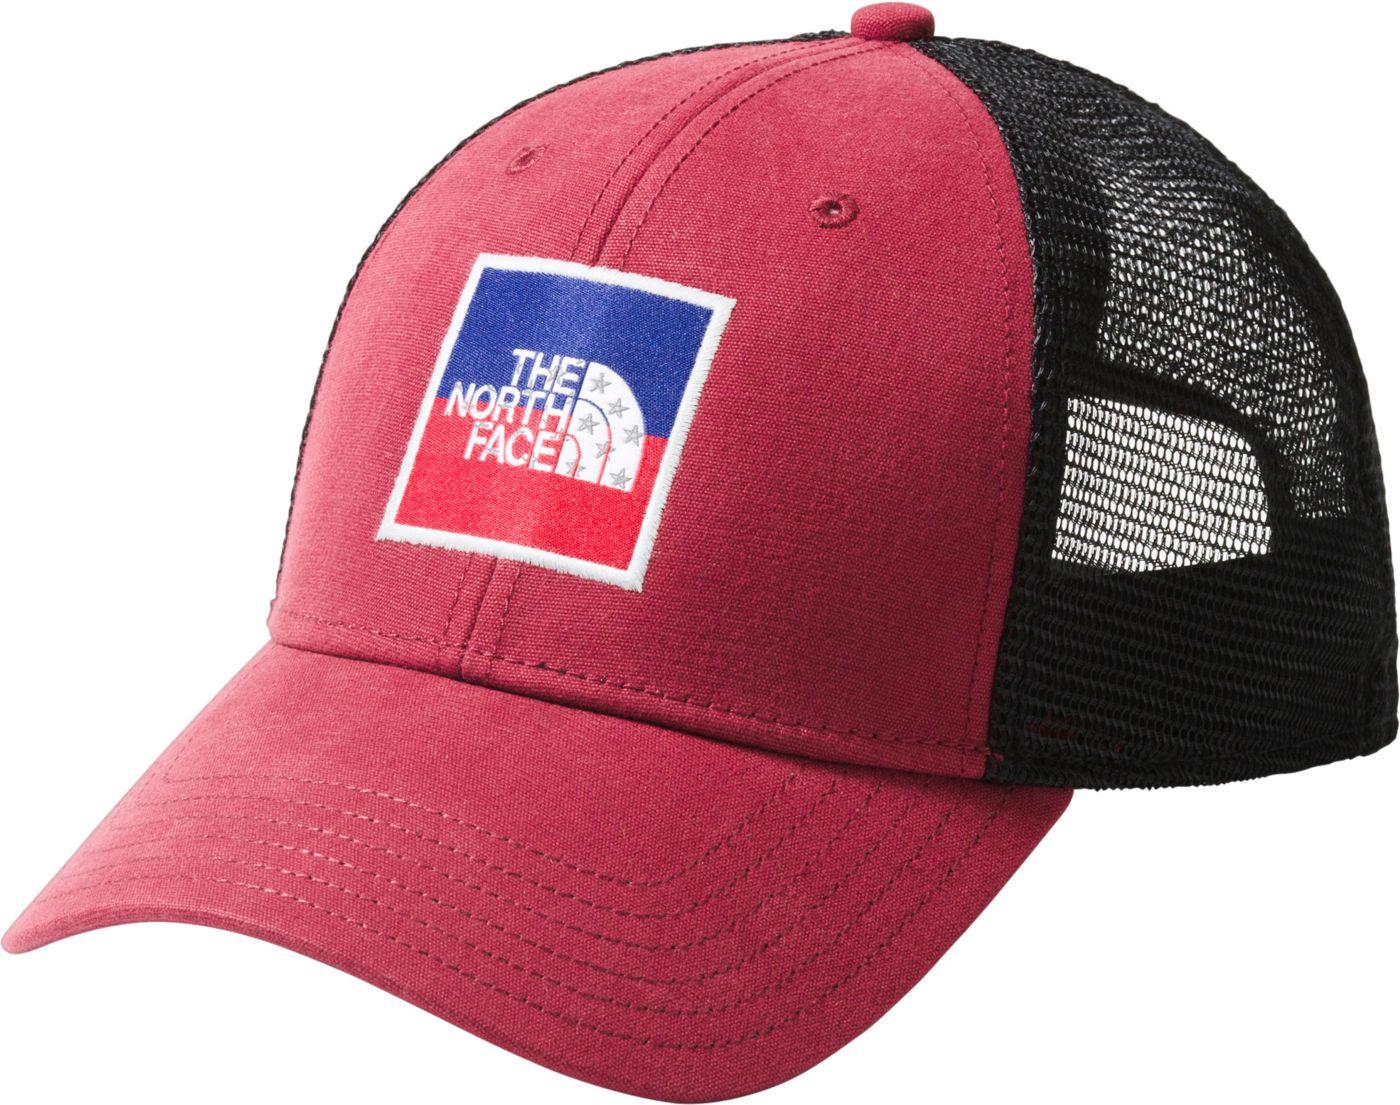 The North Face Men's Americana Trucker Hat